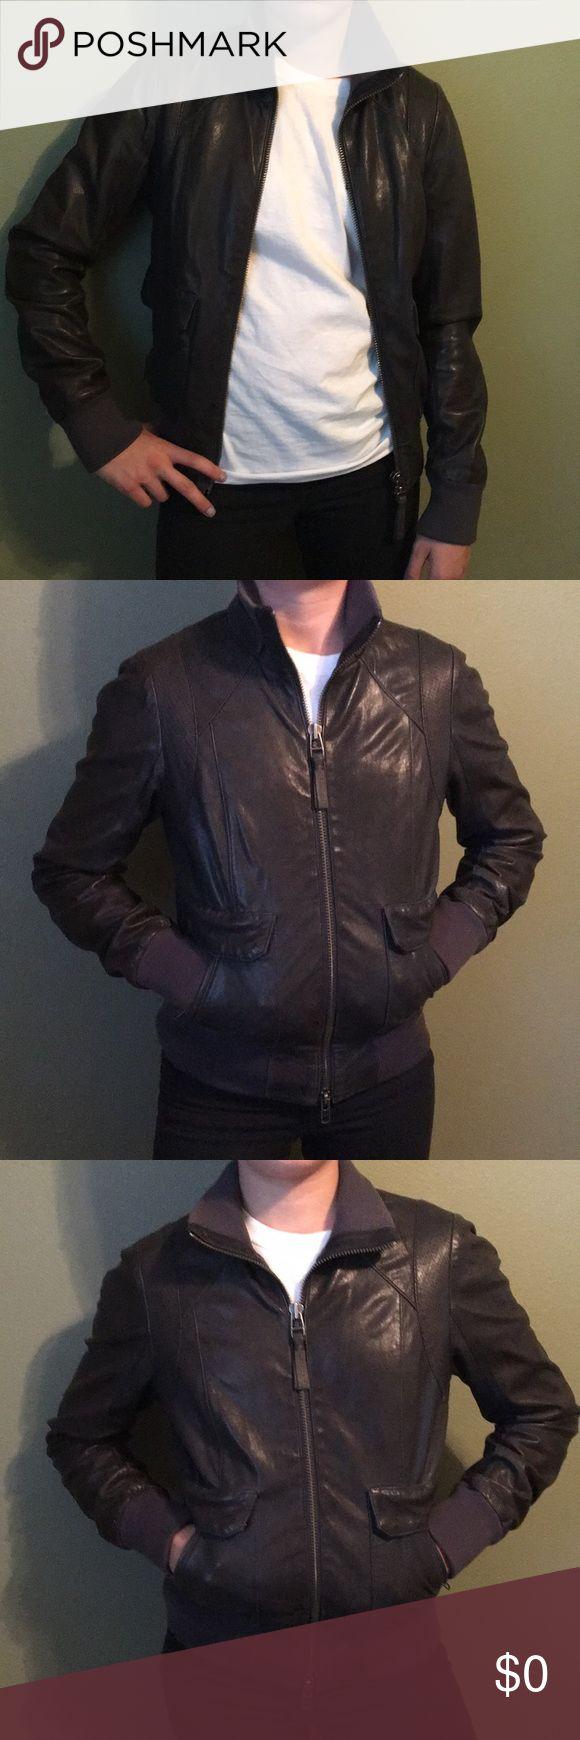 Mackage Jacket cont. More photos of Mackage Lambskin LeatherJacket Mackage Jackets & Coats